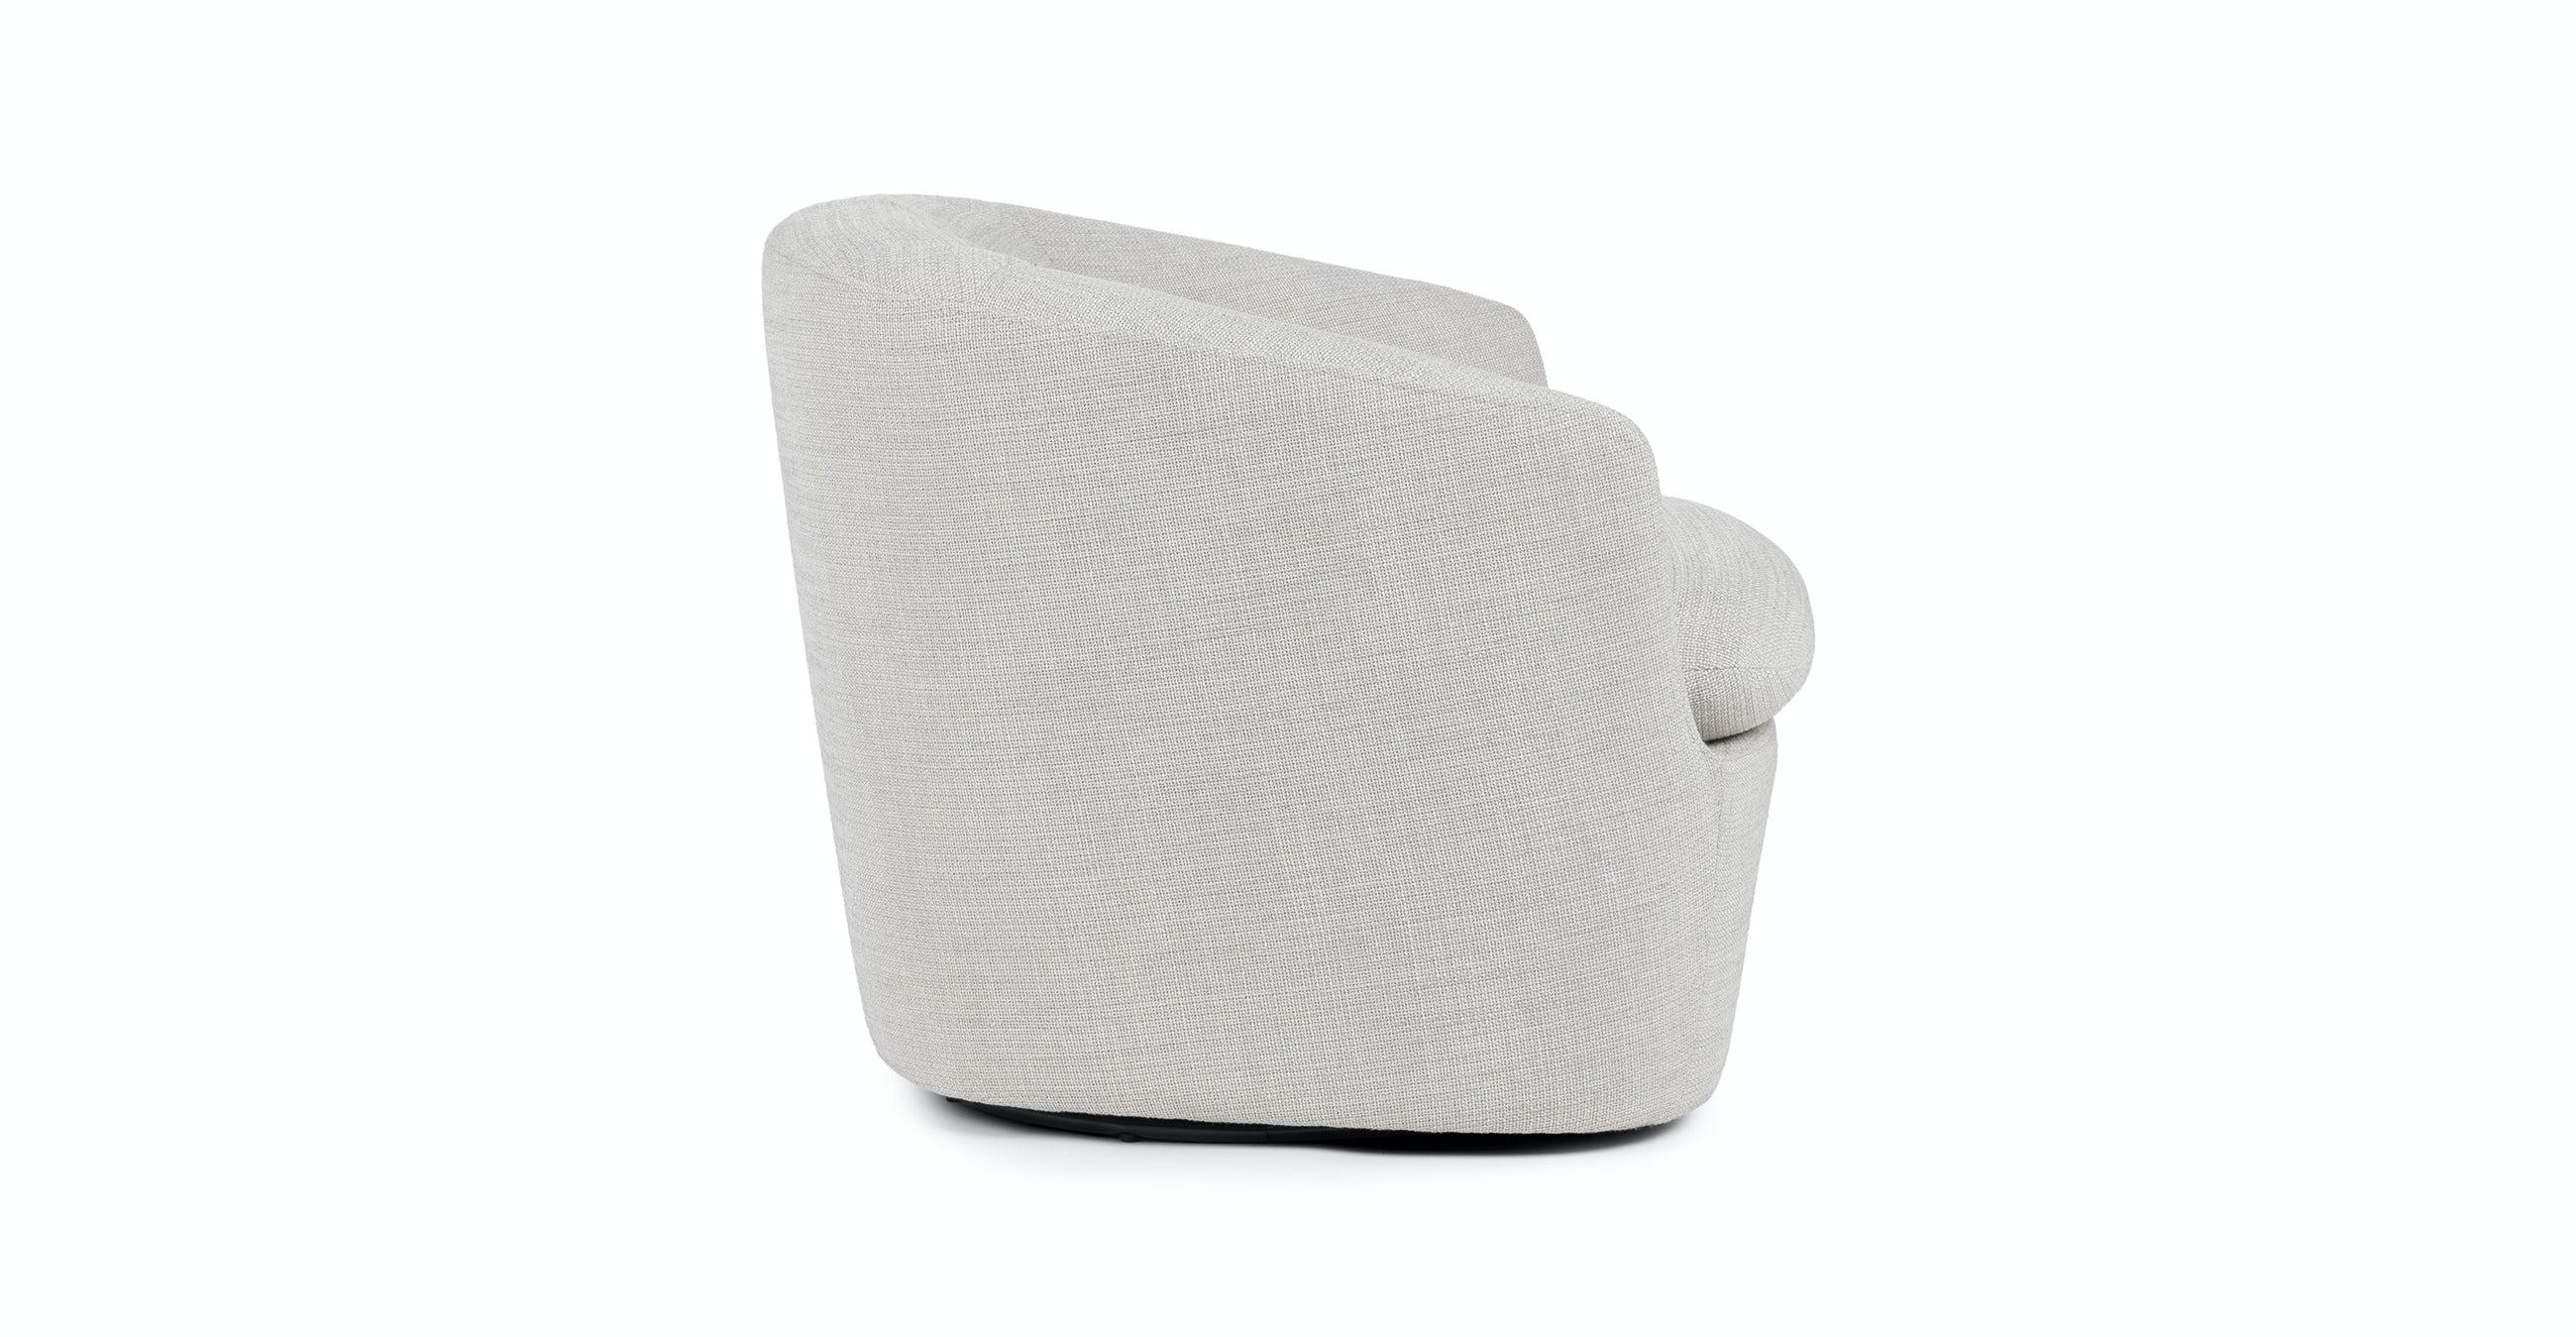 Turoy Wicklow Gray Chair